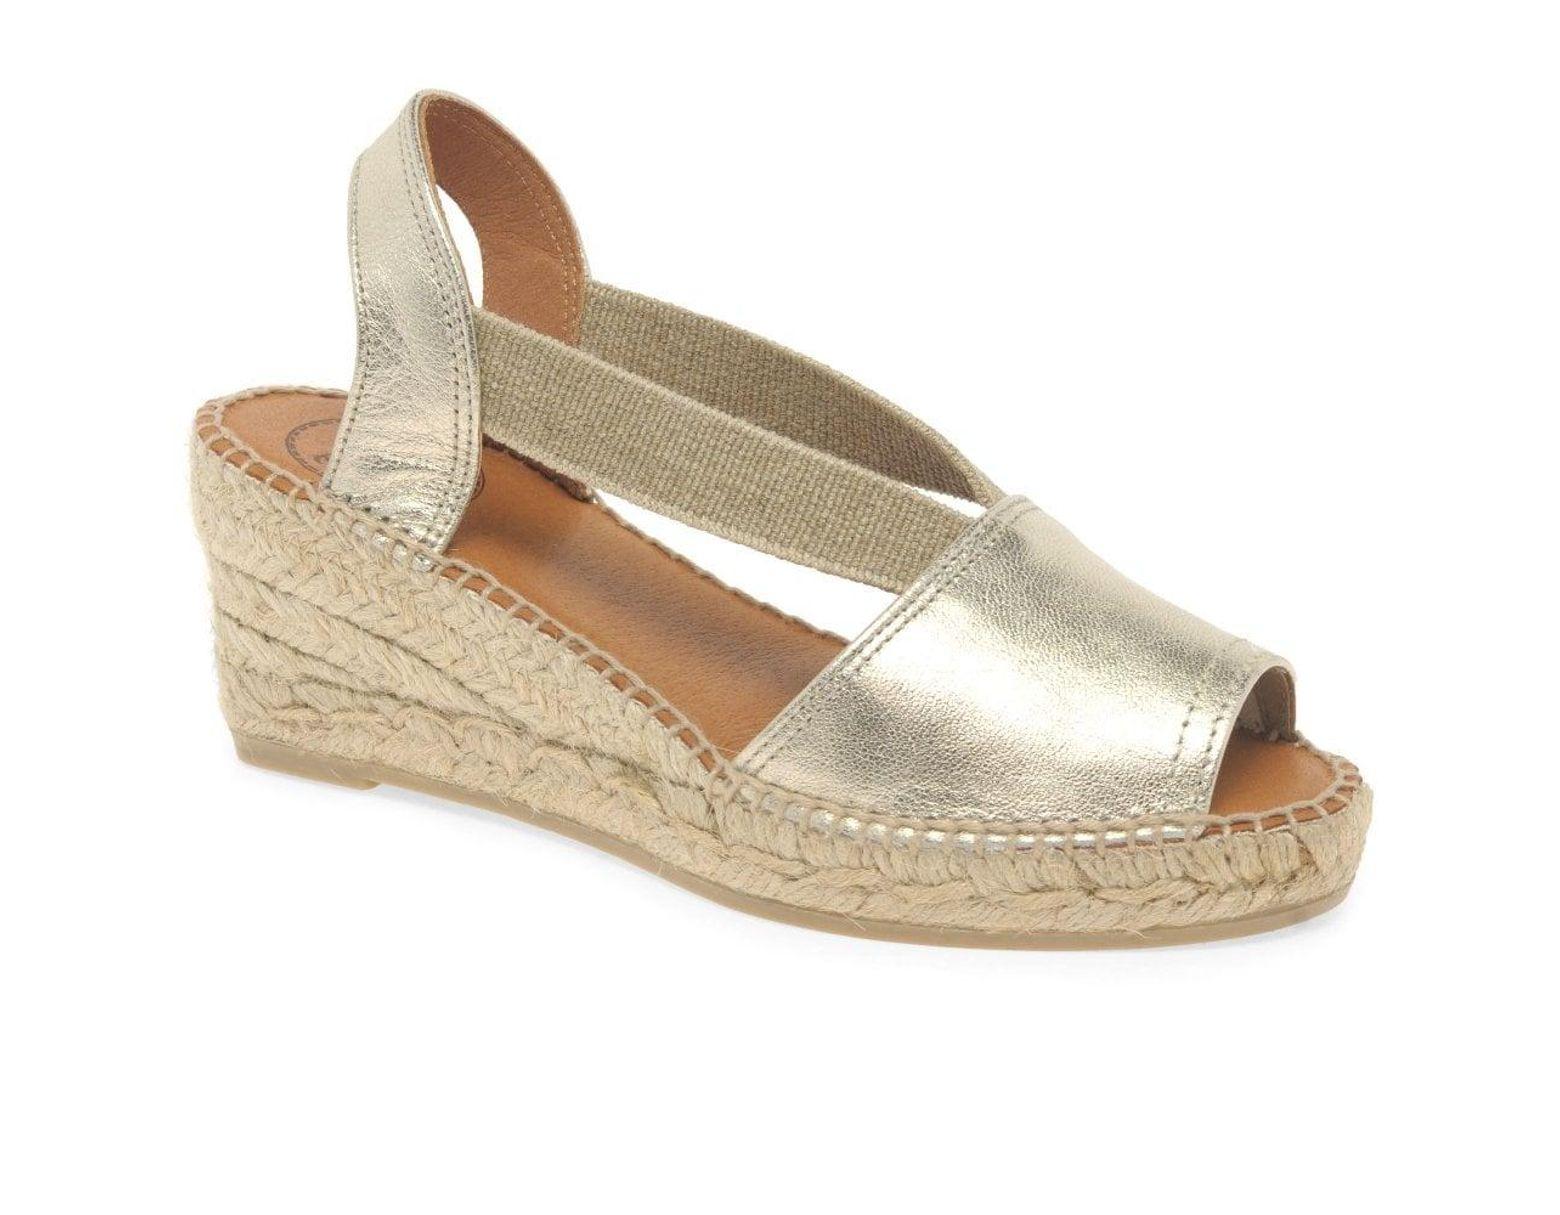 a2431618f9c Teide P Womens Wedge Heel Espadrilles